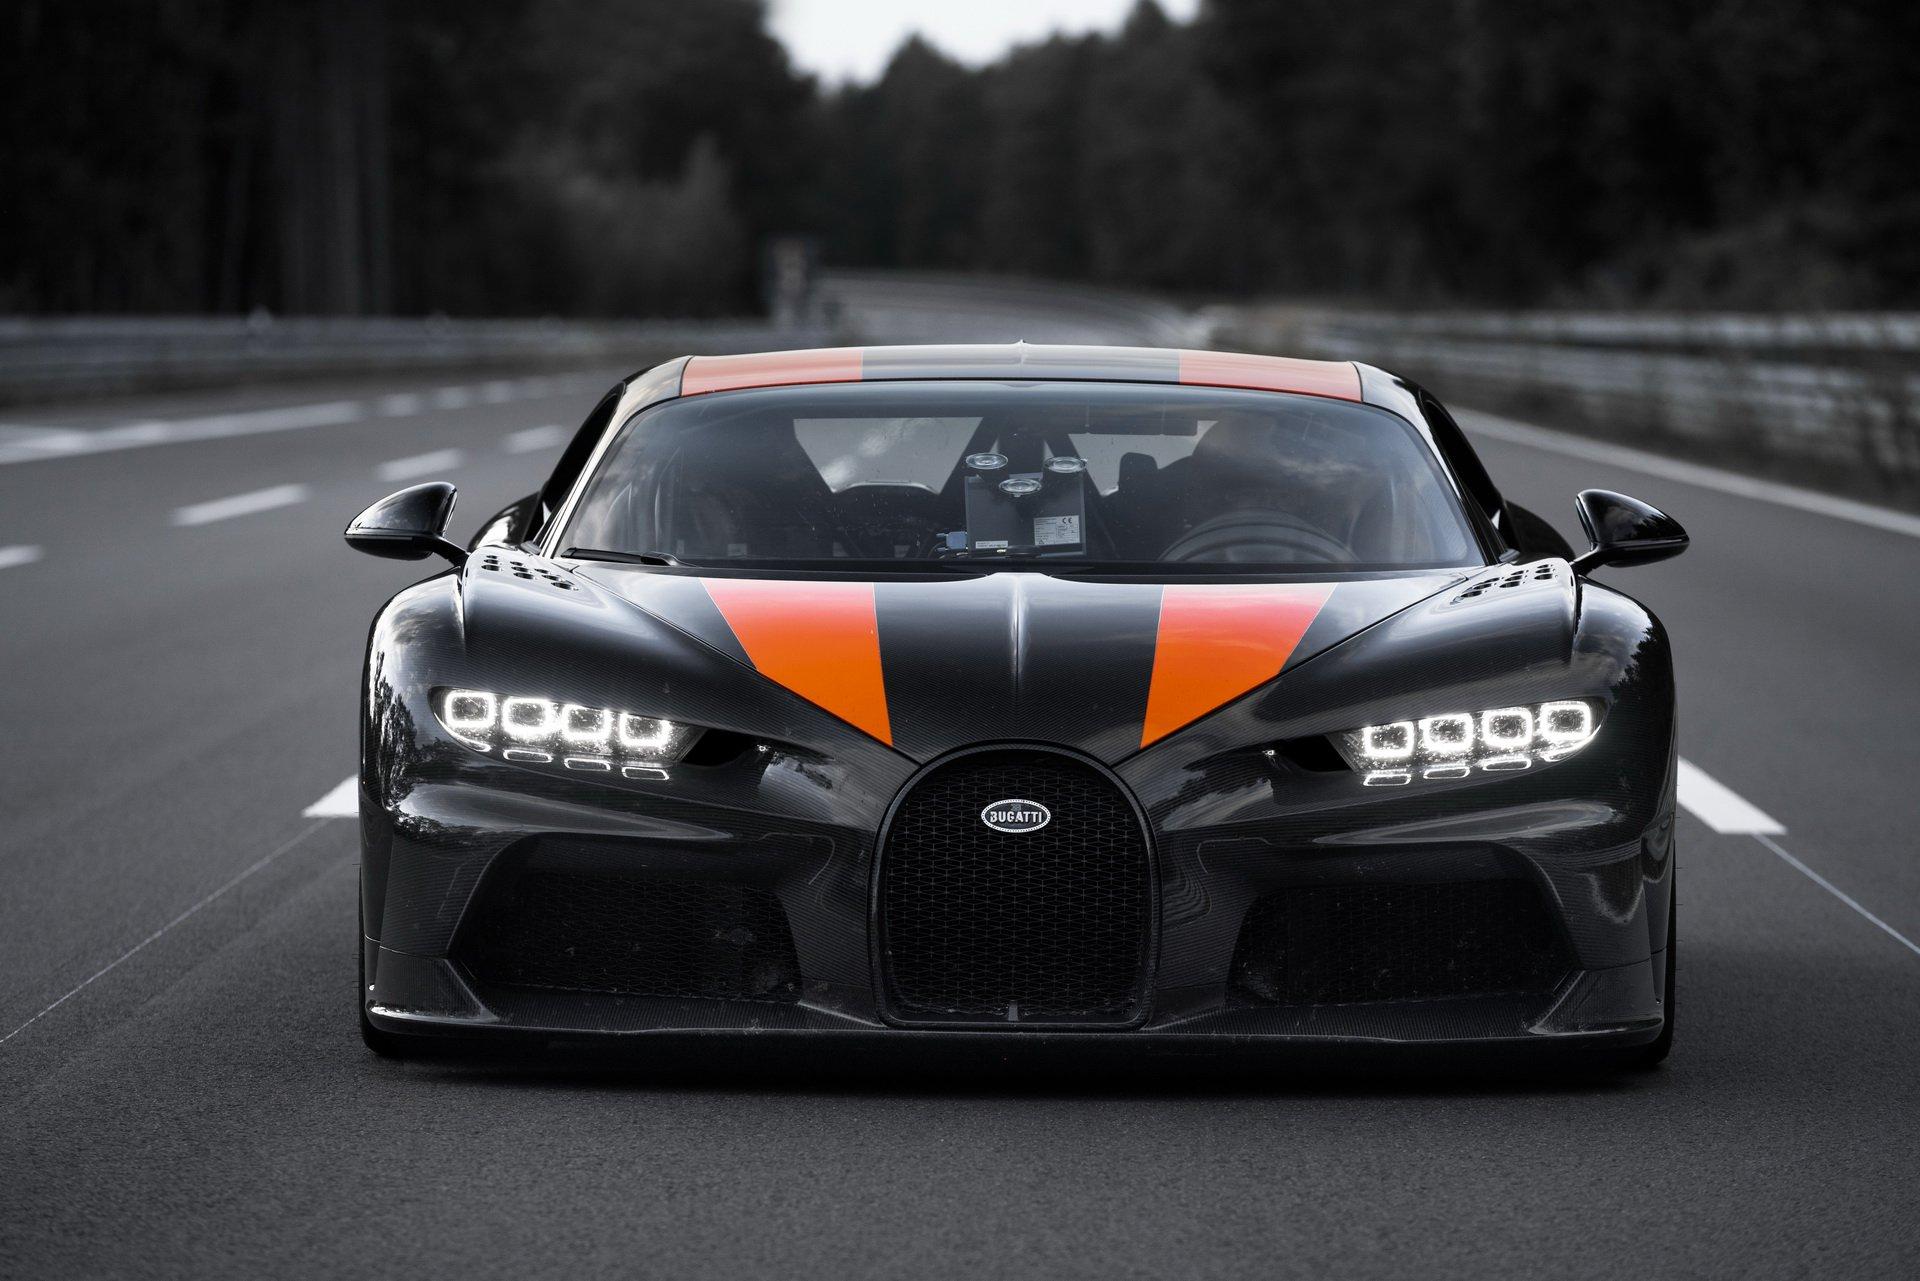 bugatti-chiron-topspeedrun-04.jpg